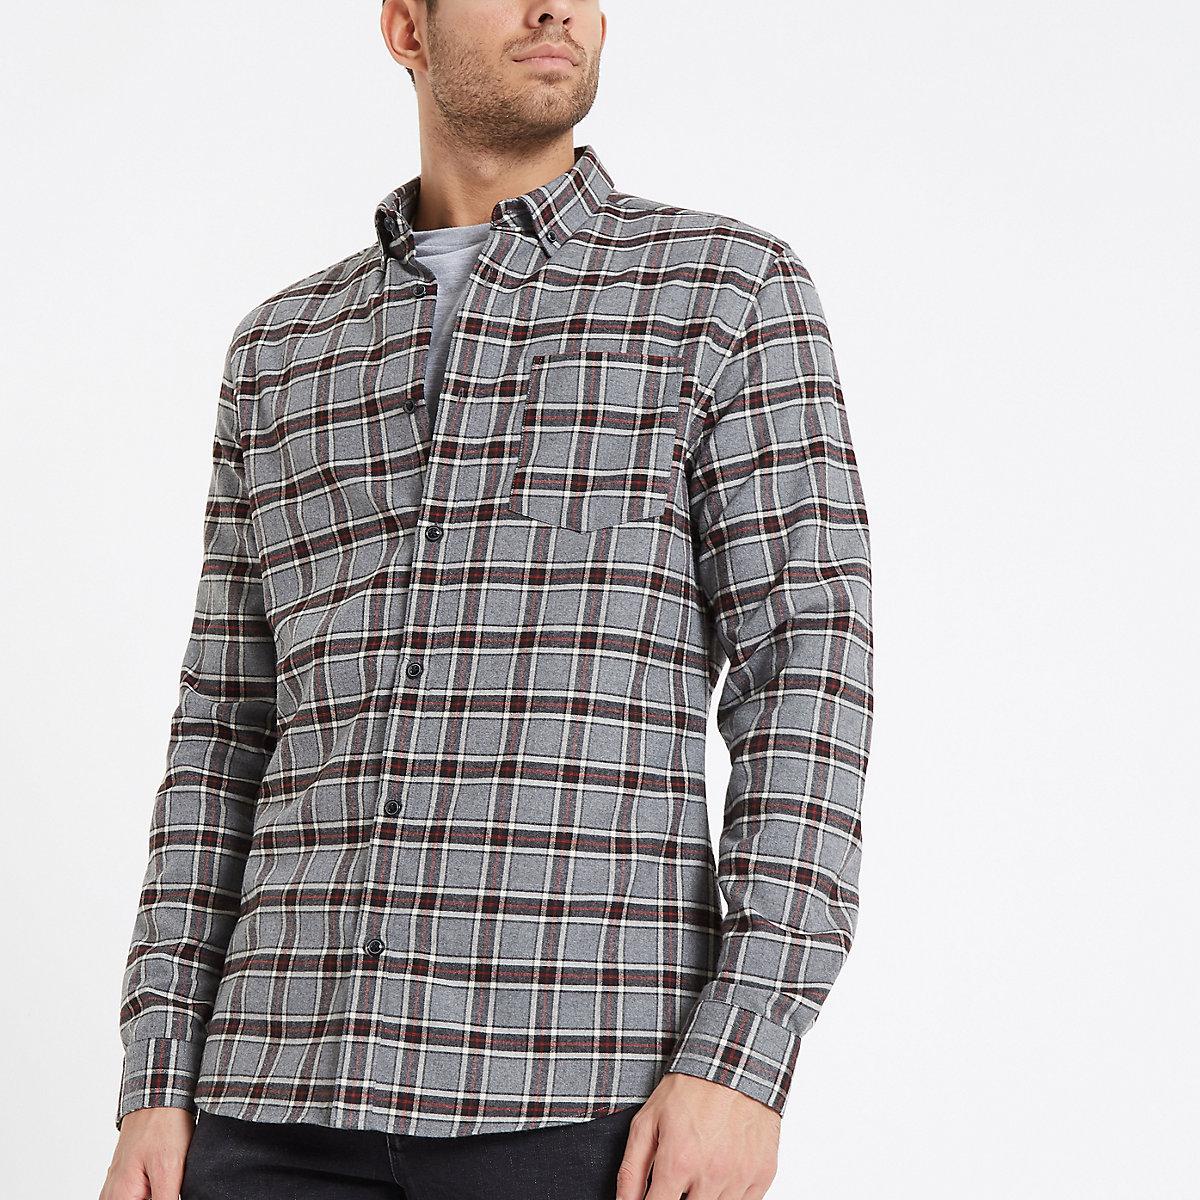 Grey and black check button-down shirt